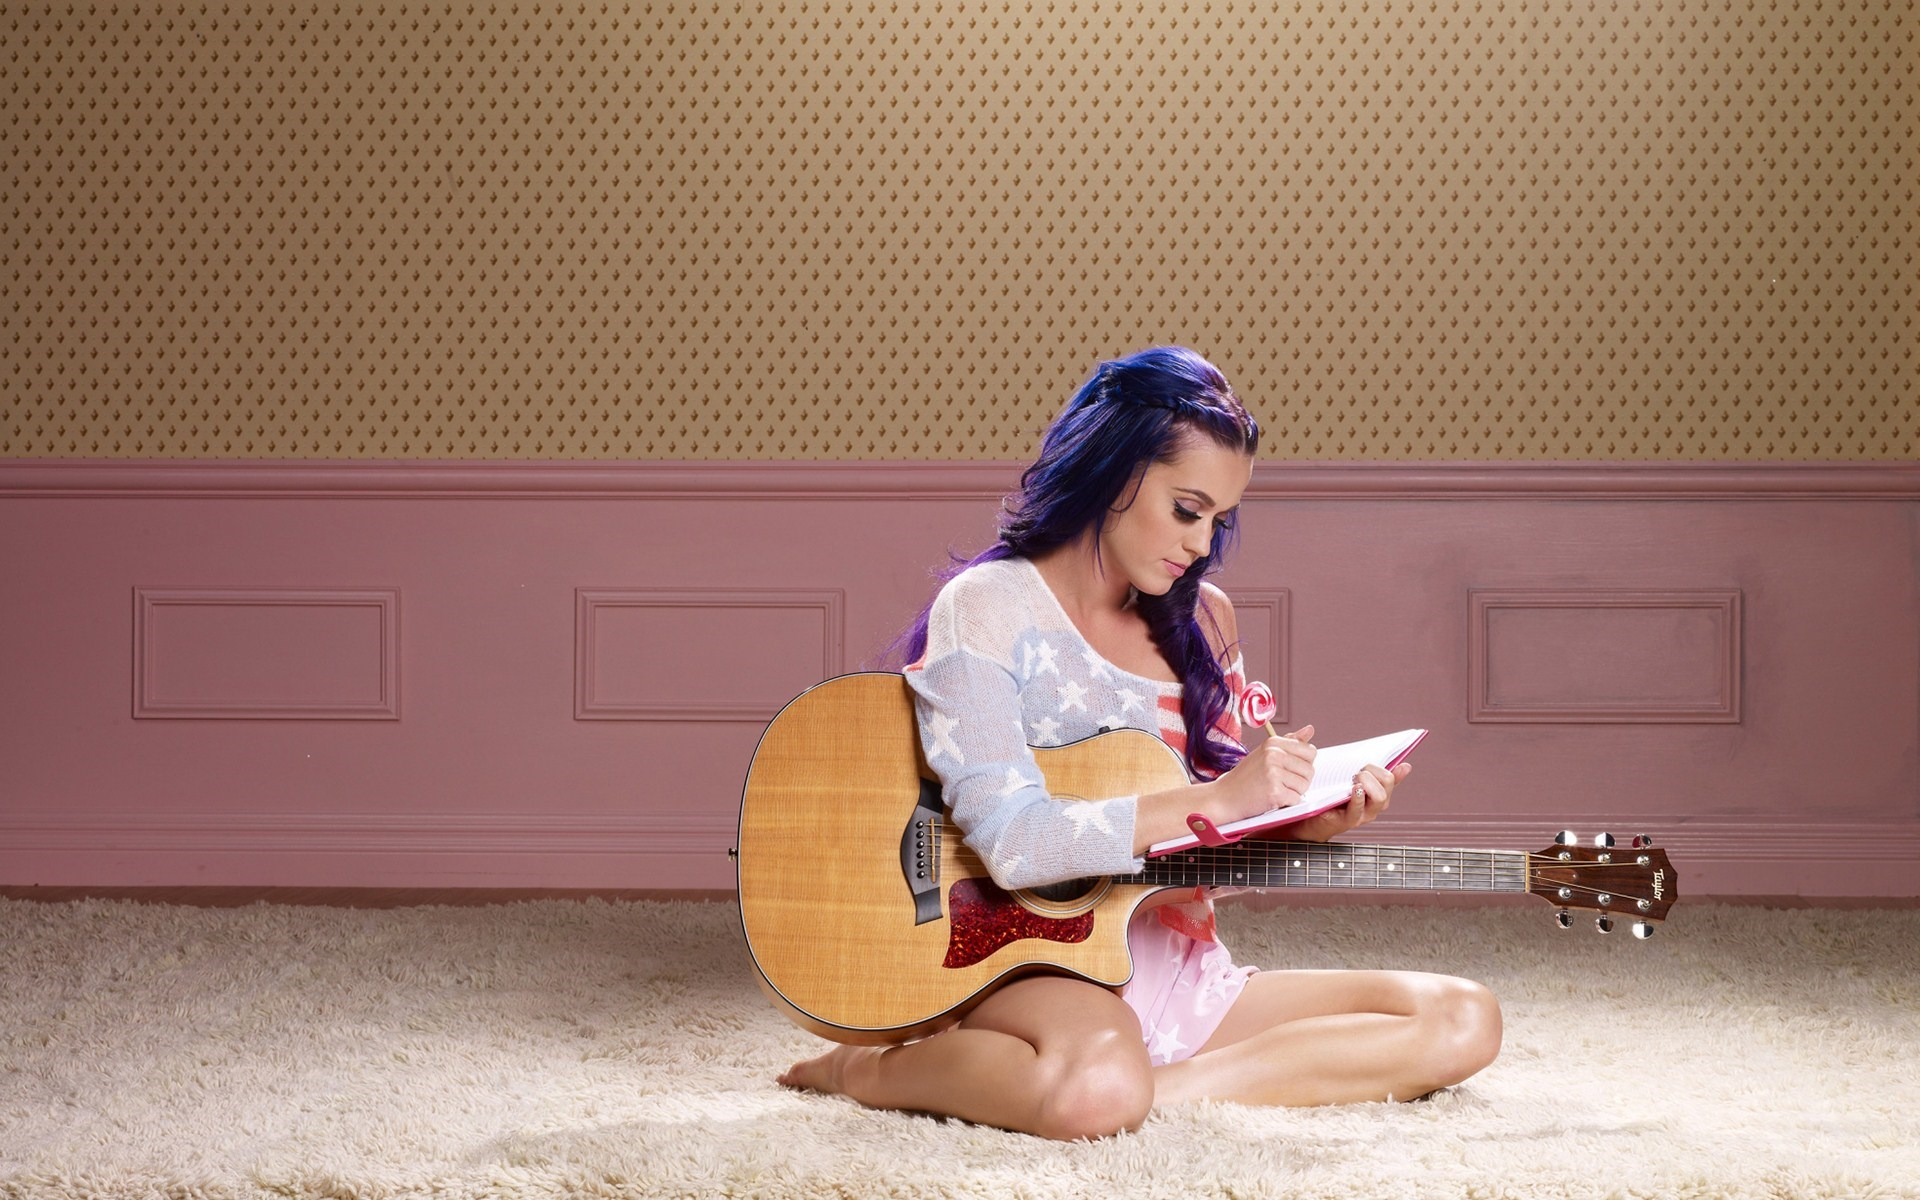 Katy Perry Lovely Singer Guitar Music